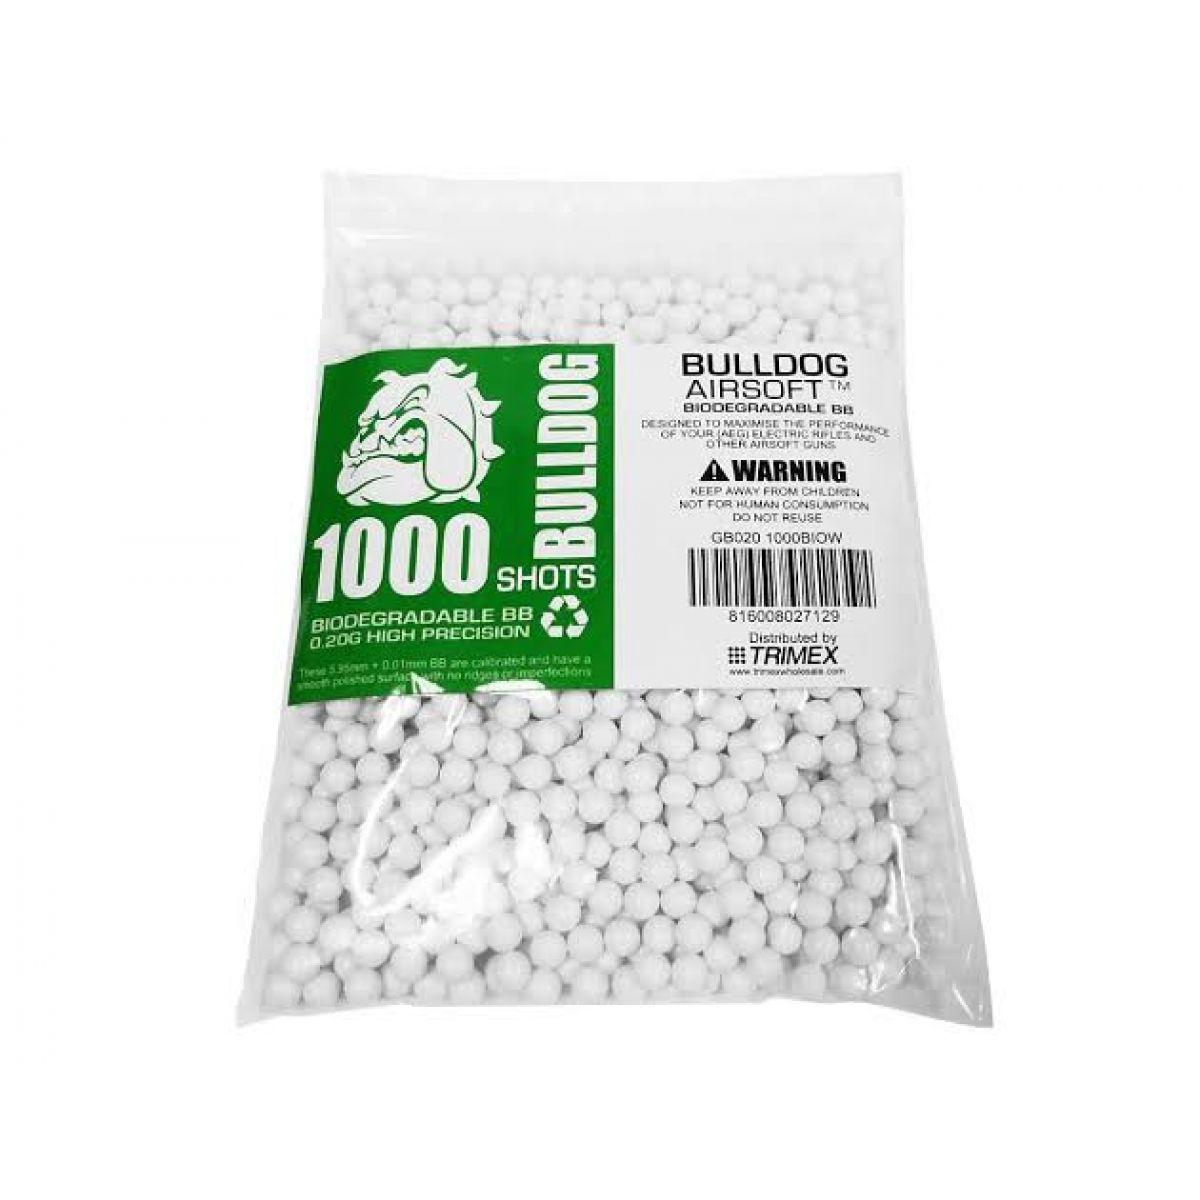 Bulldog BB 6mm Biodegradable best